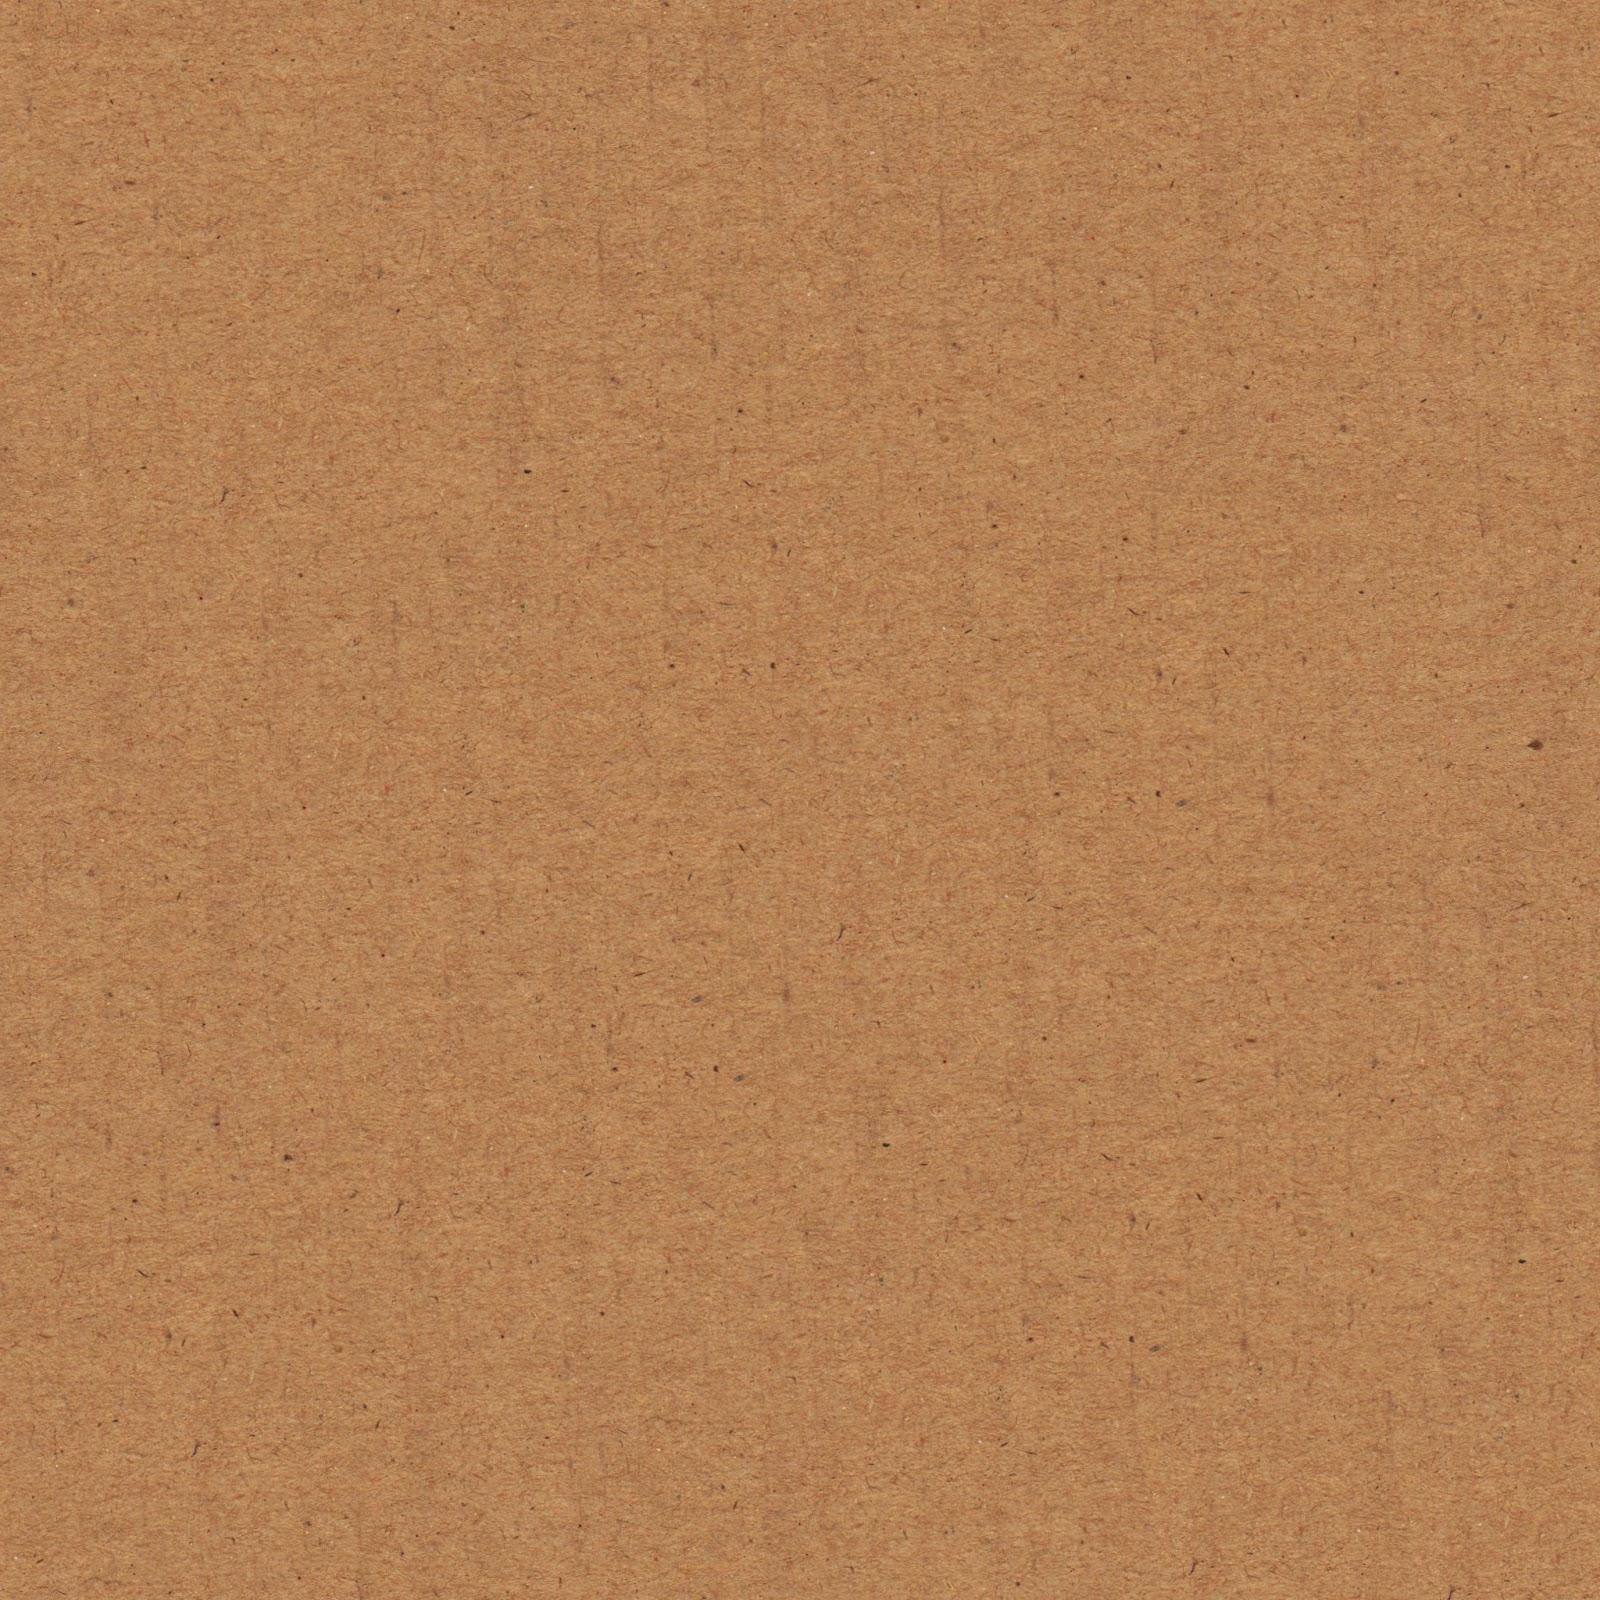 Seamless Cardboard Texture + (Maps) | Texturise Free ...